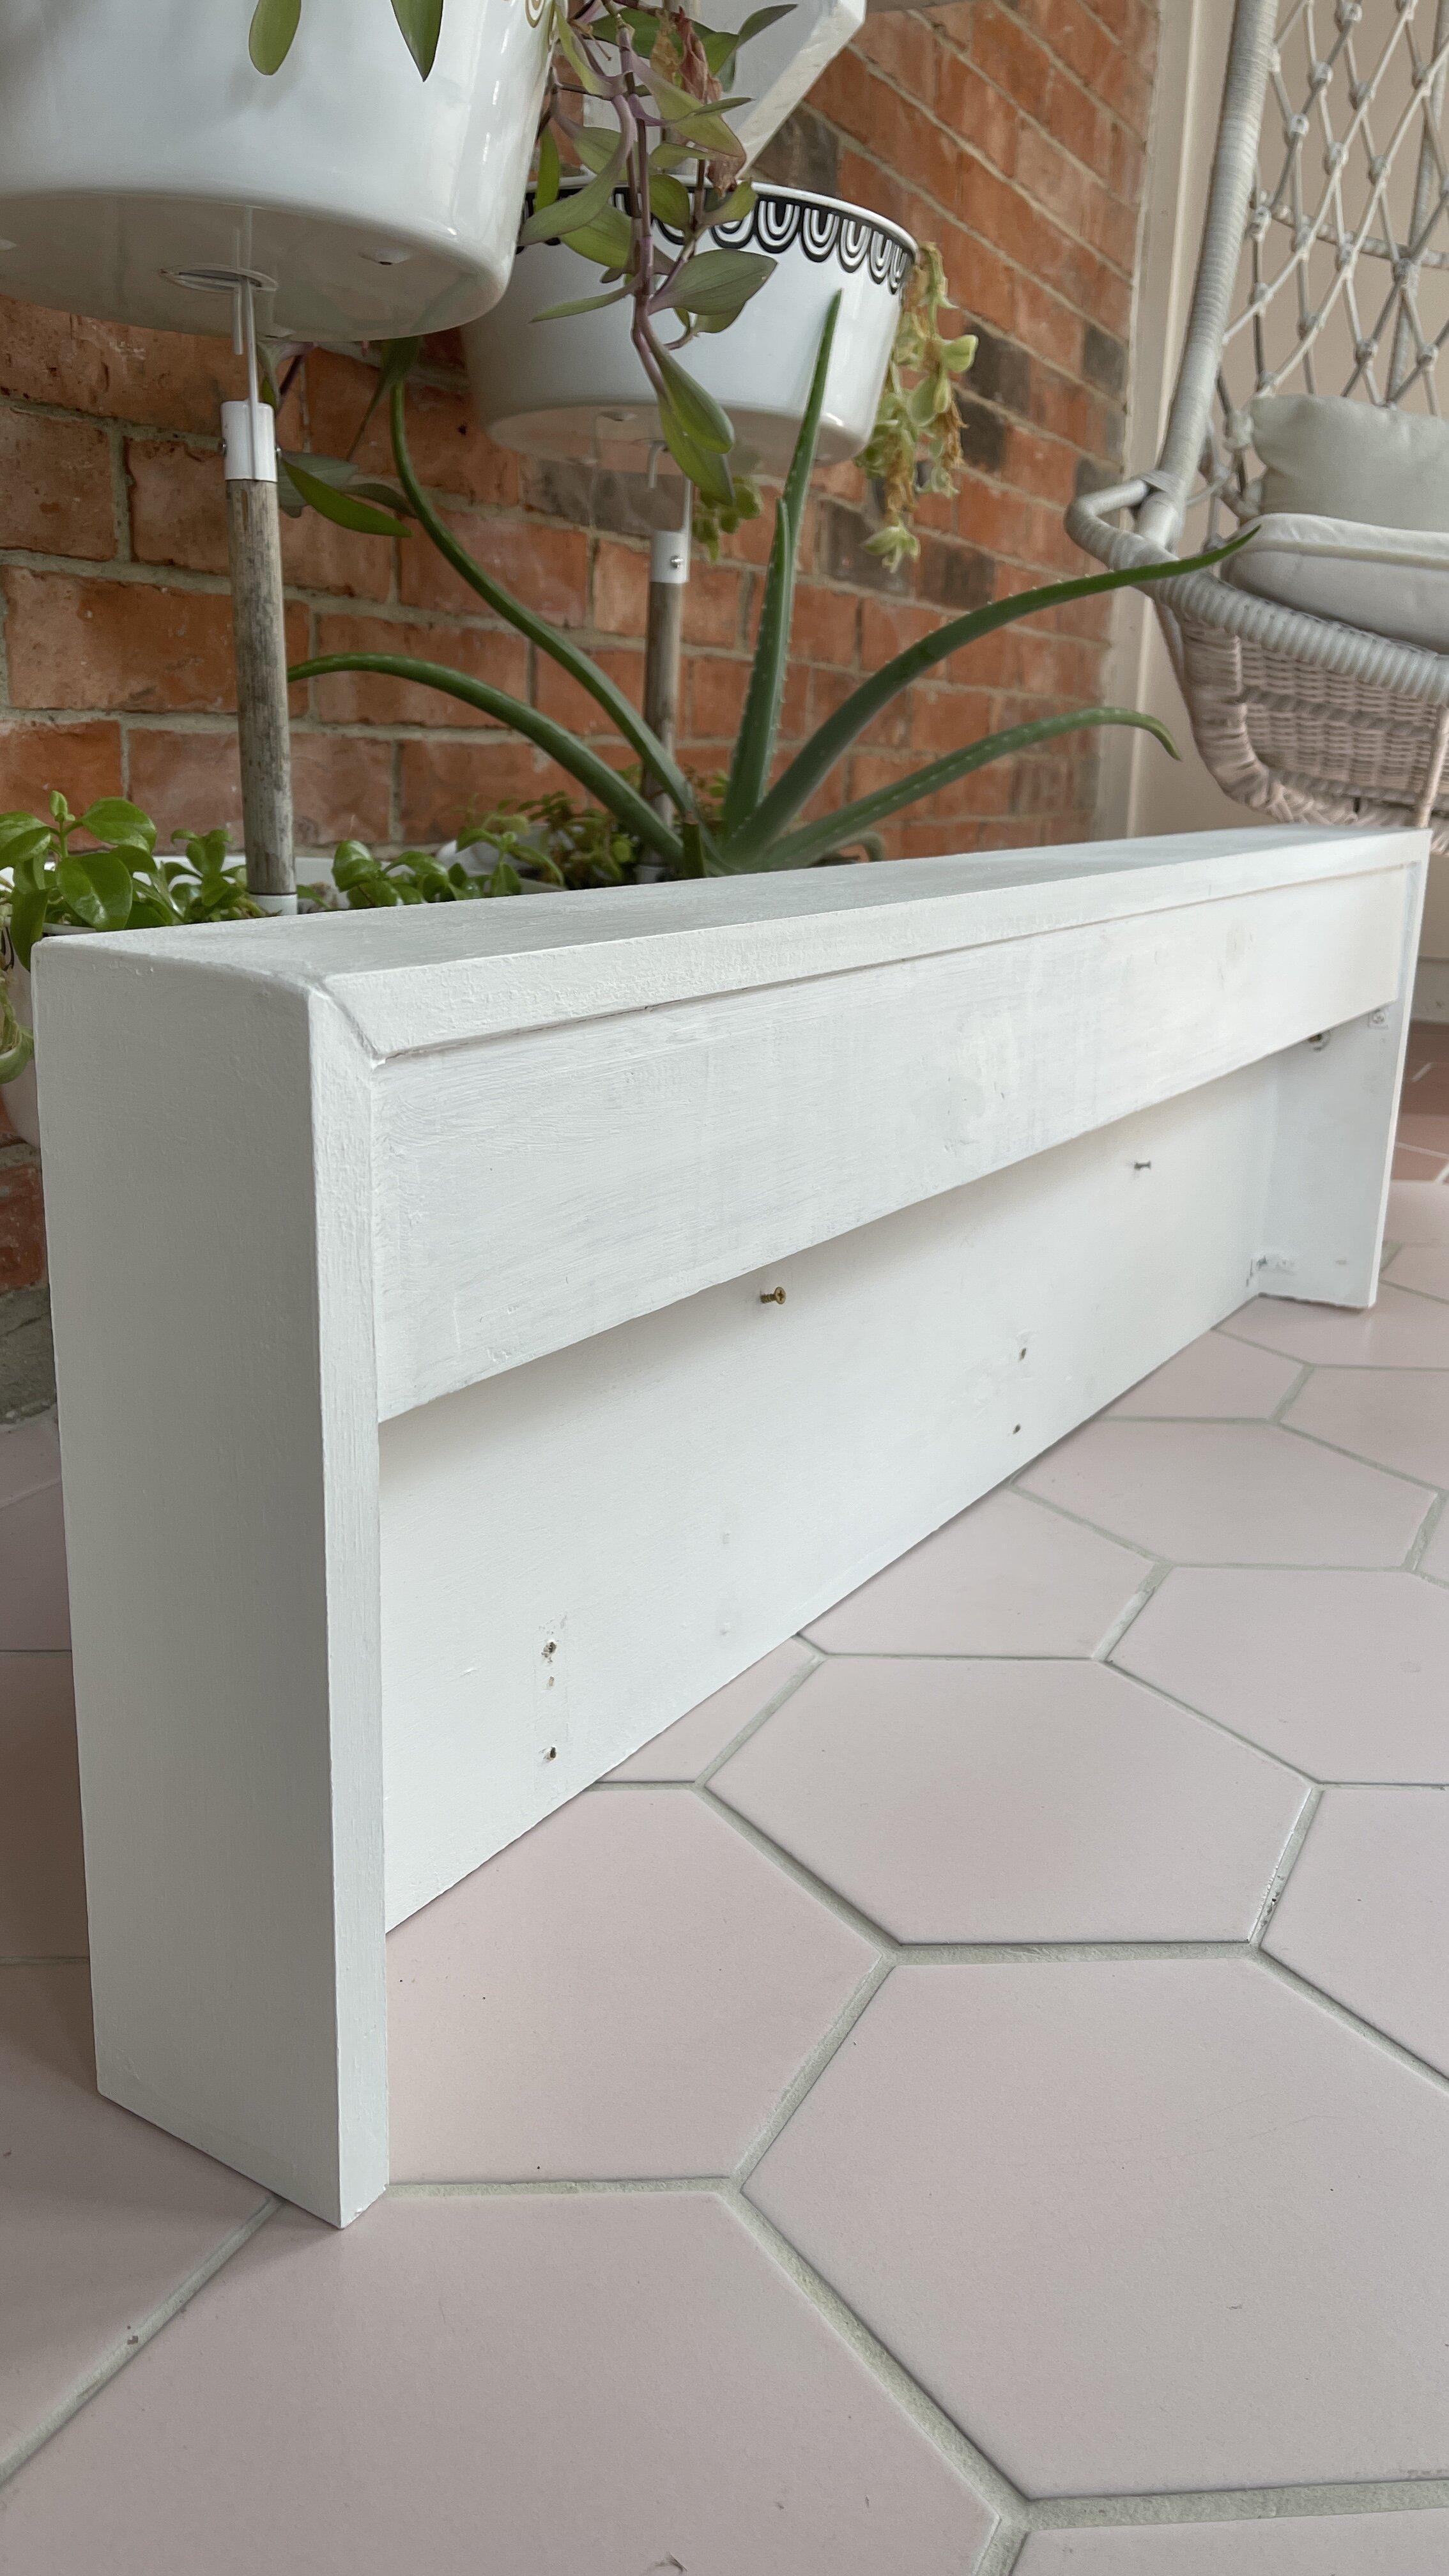 DIY TV Cover Shelf Build Detail 4.JPG